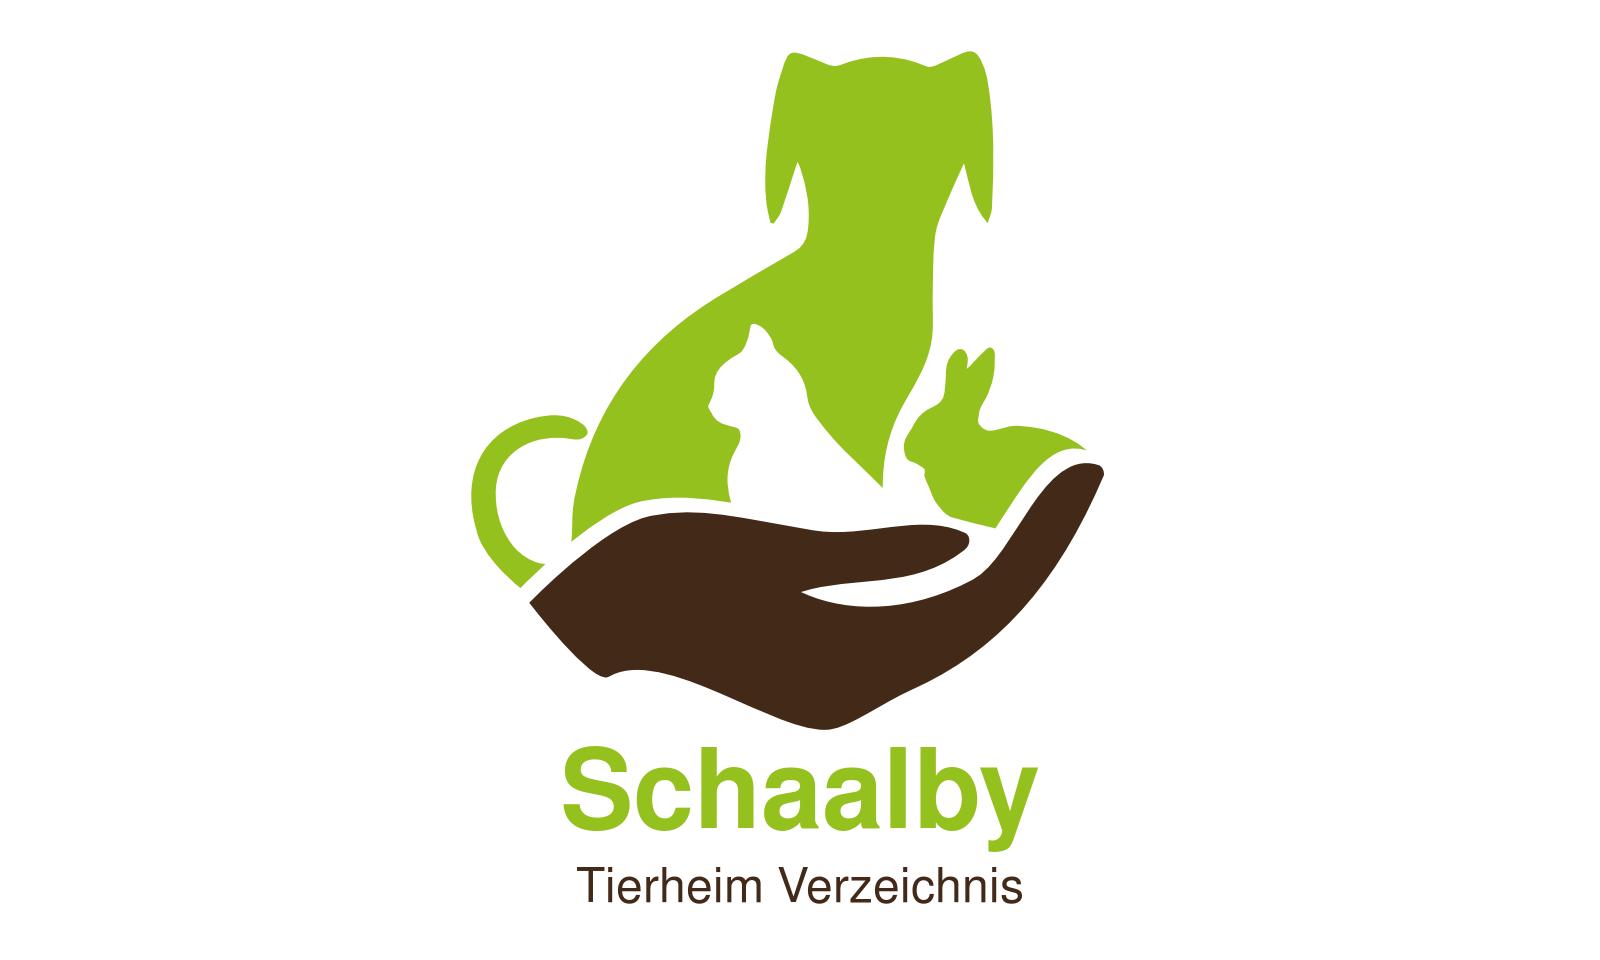 Tierheim Schaalby